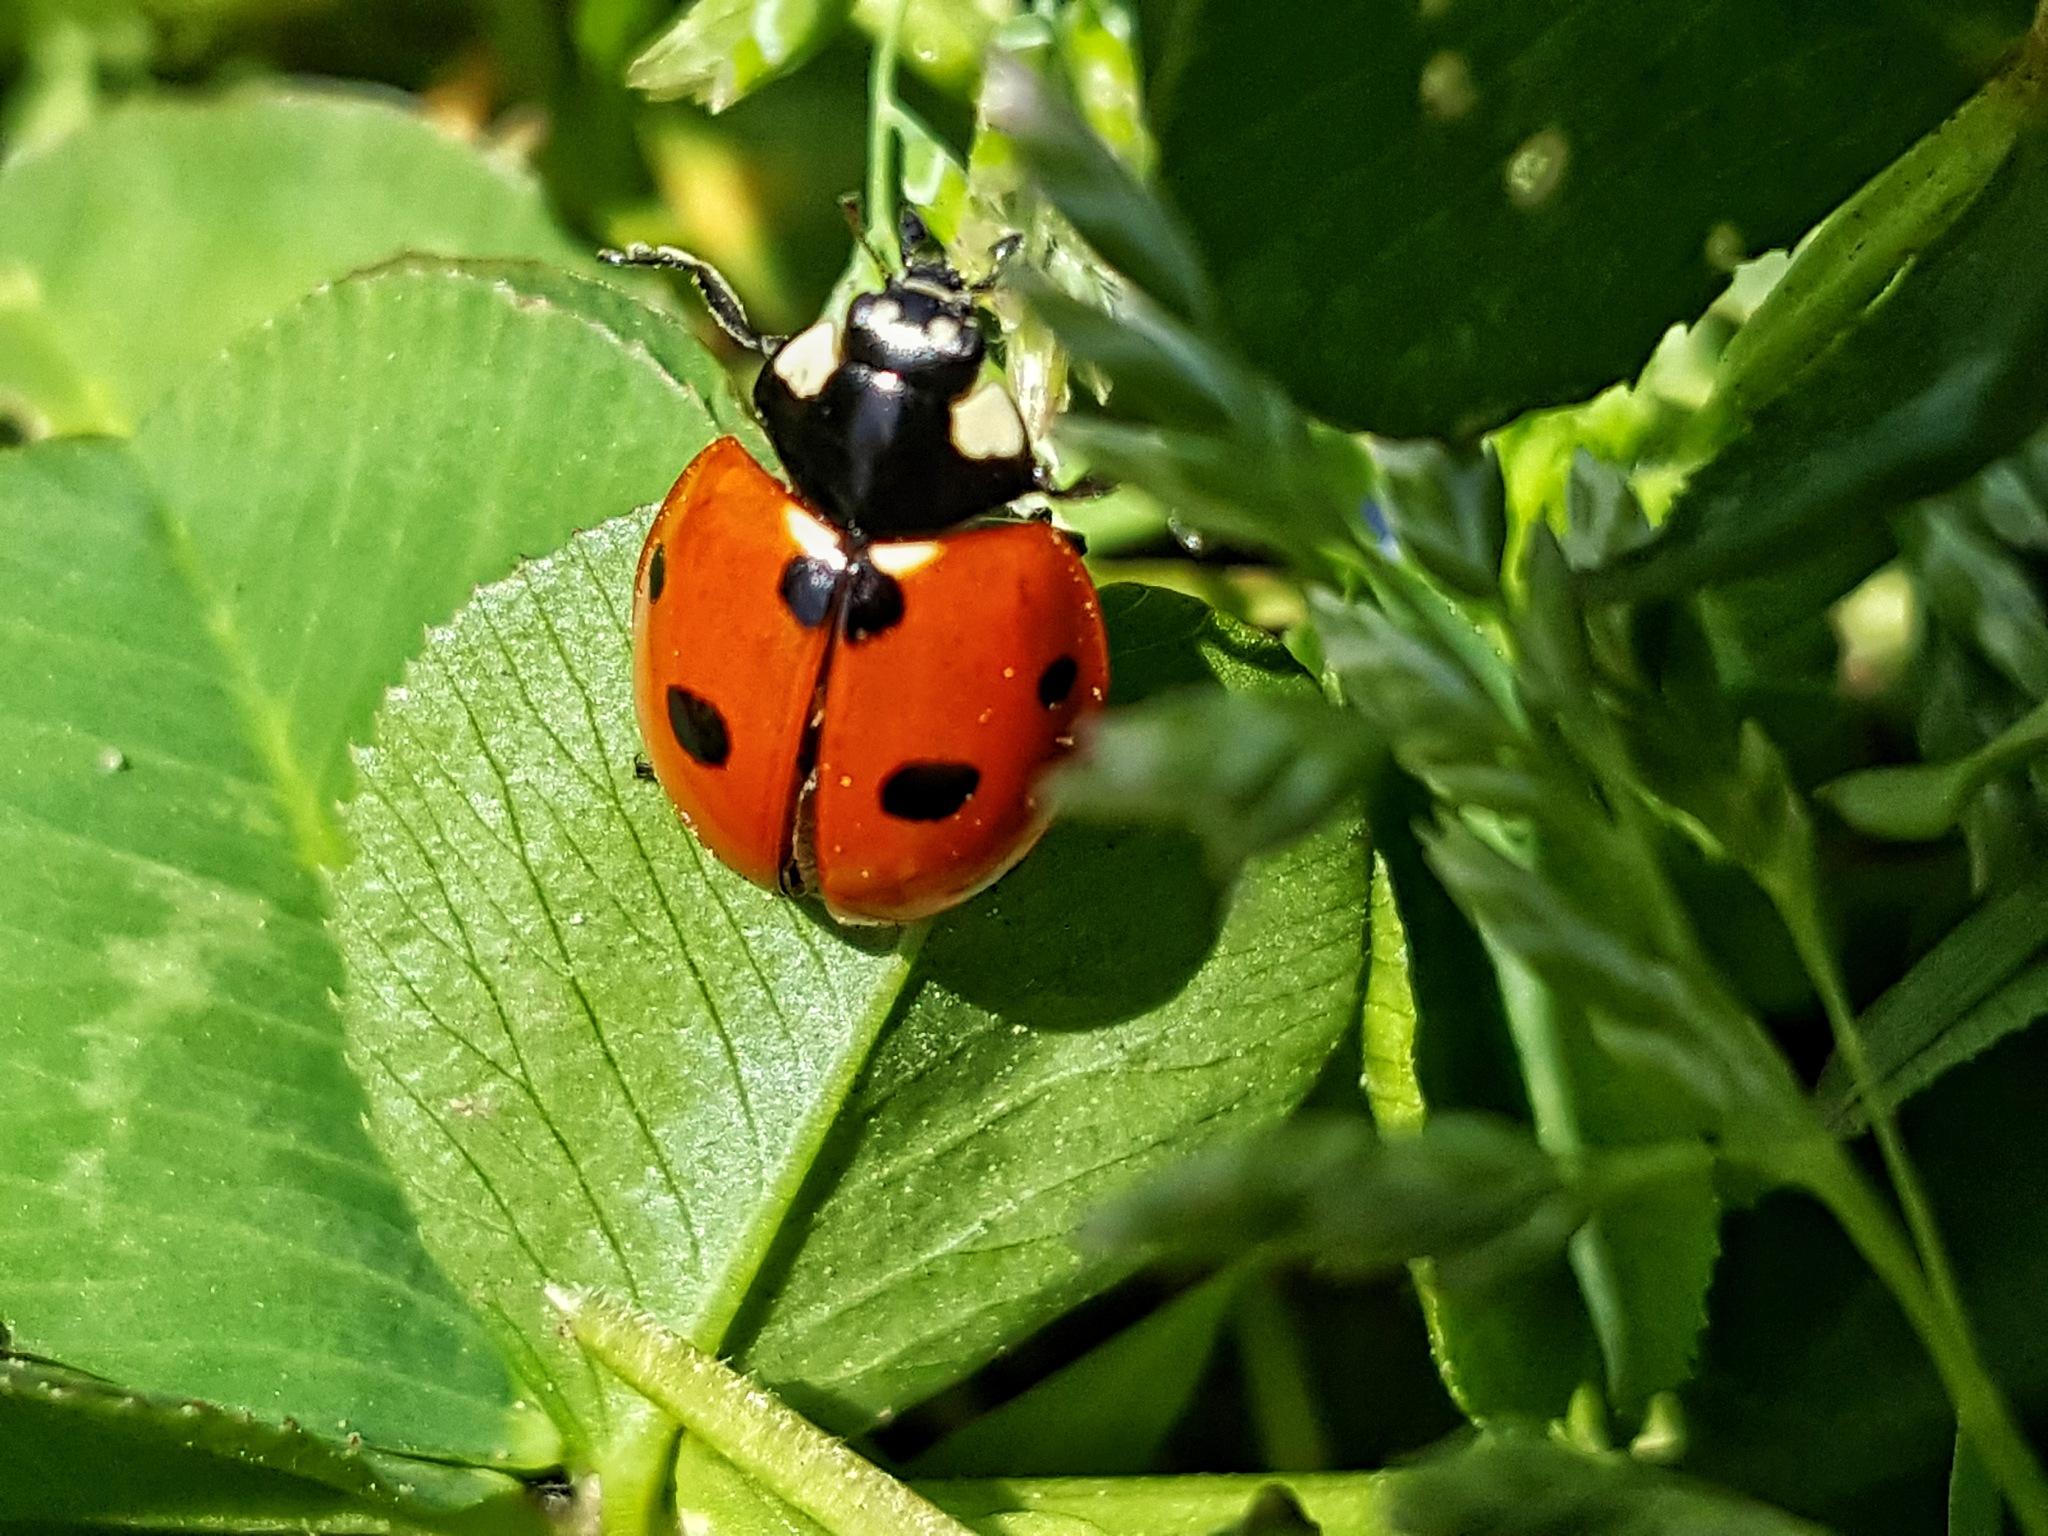 Margot the Ladybug by GABRIEL HERNANDEZ